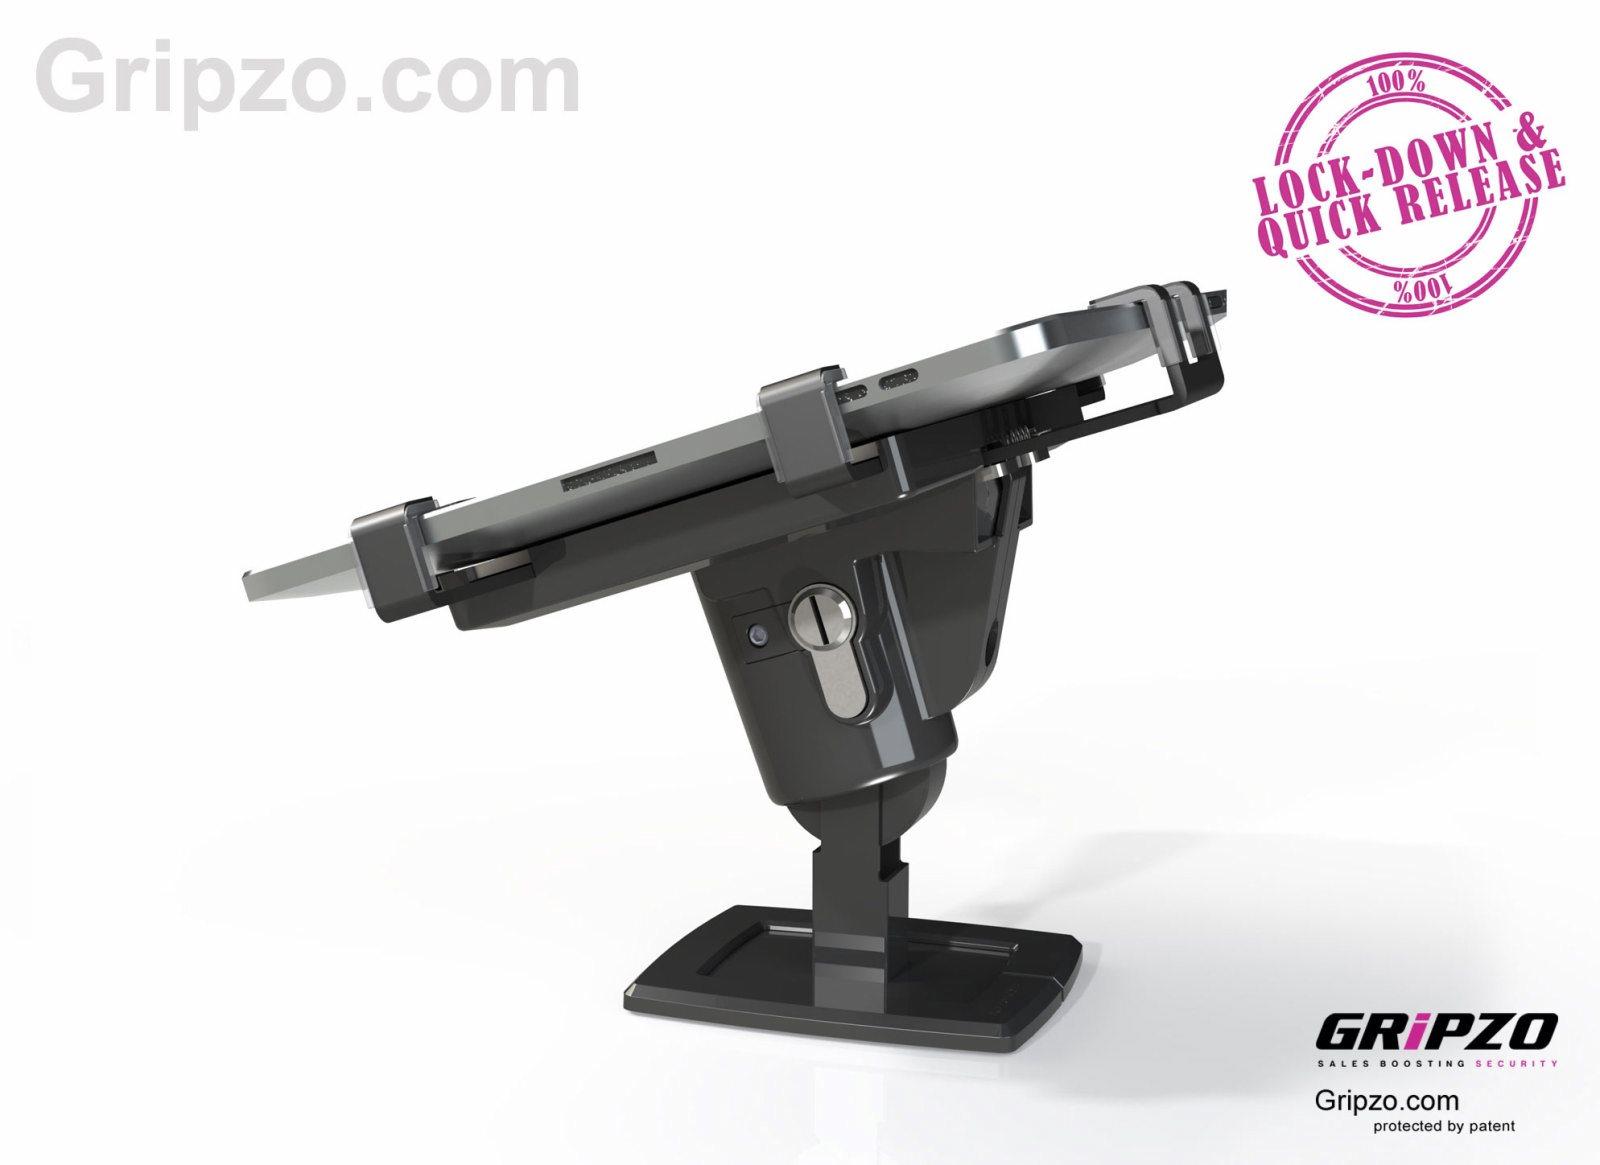 gripzo-allblack-2-met-logo.jpg